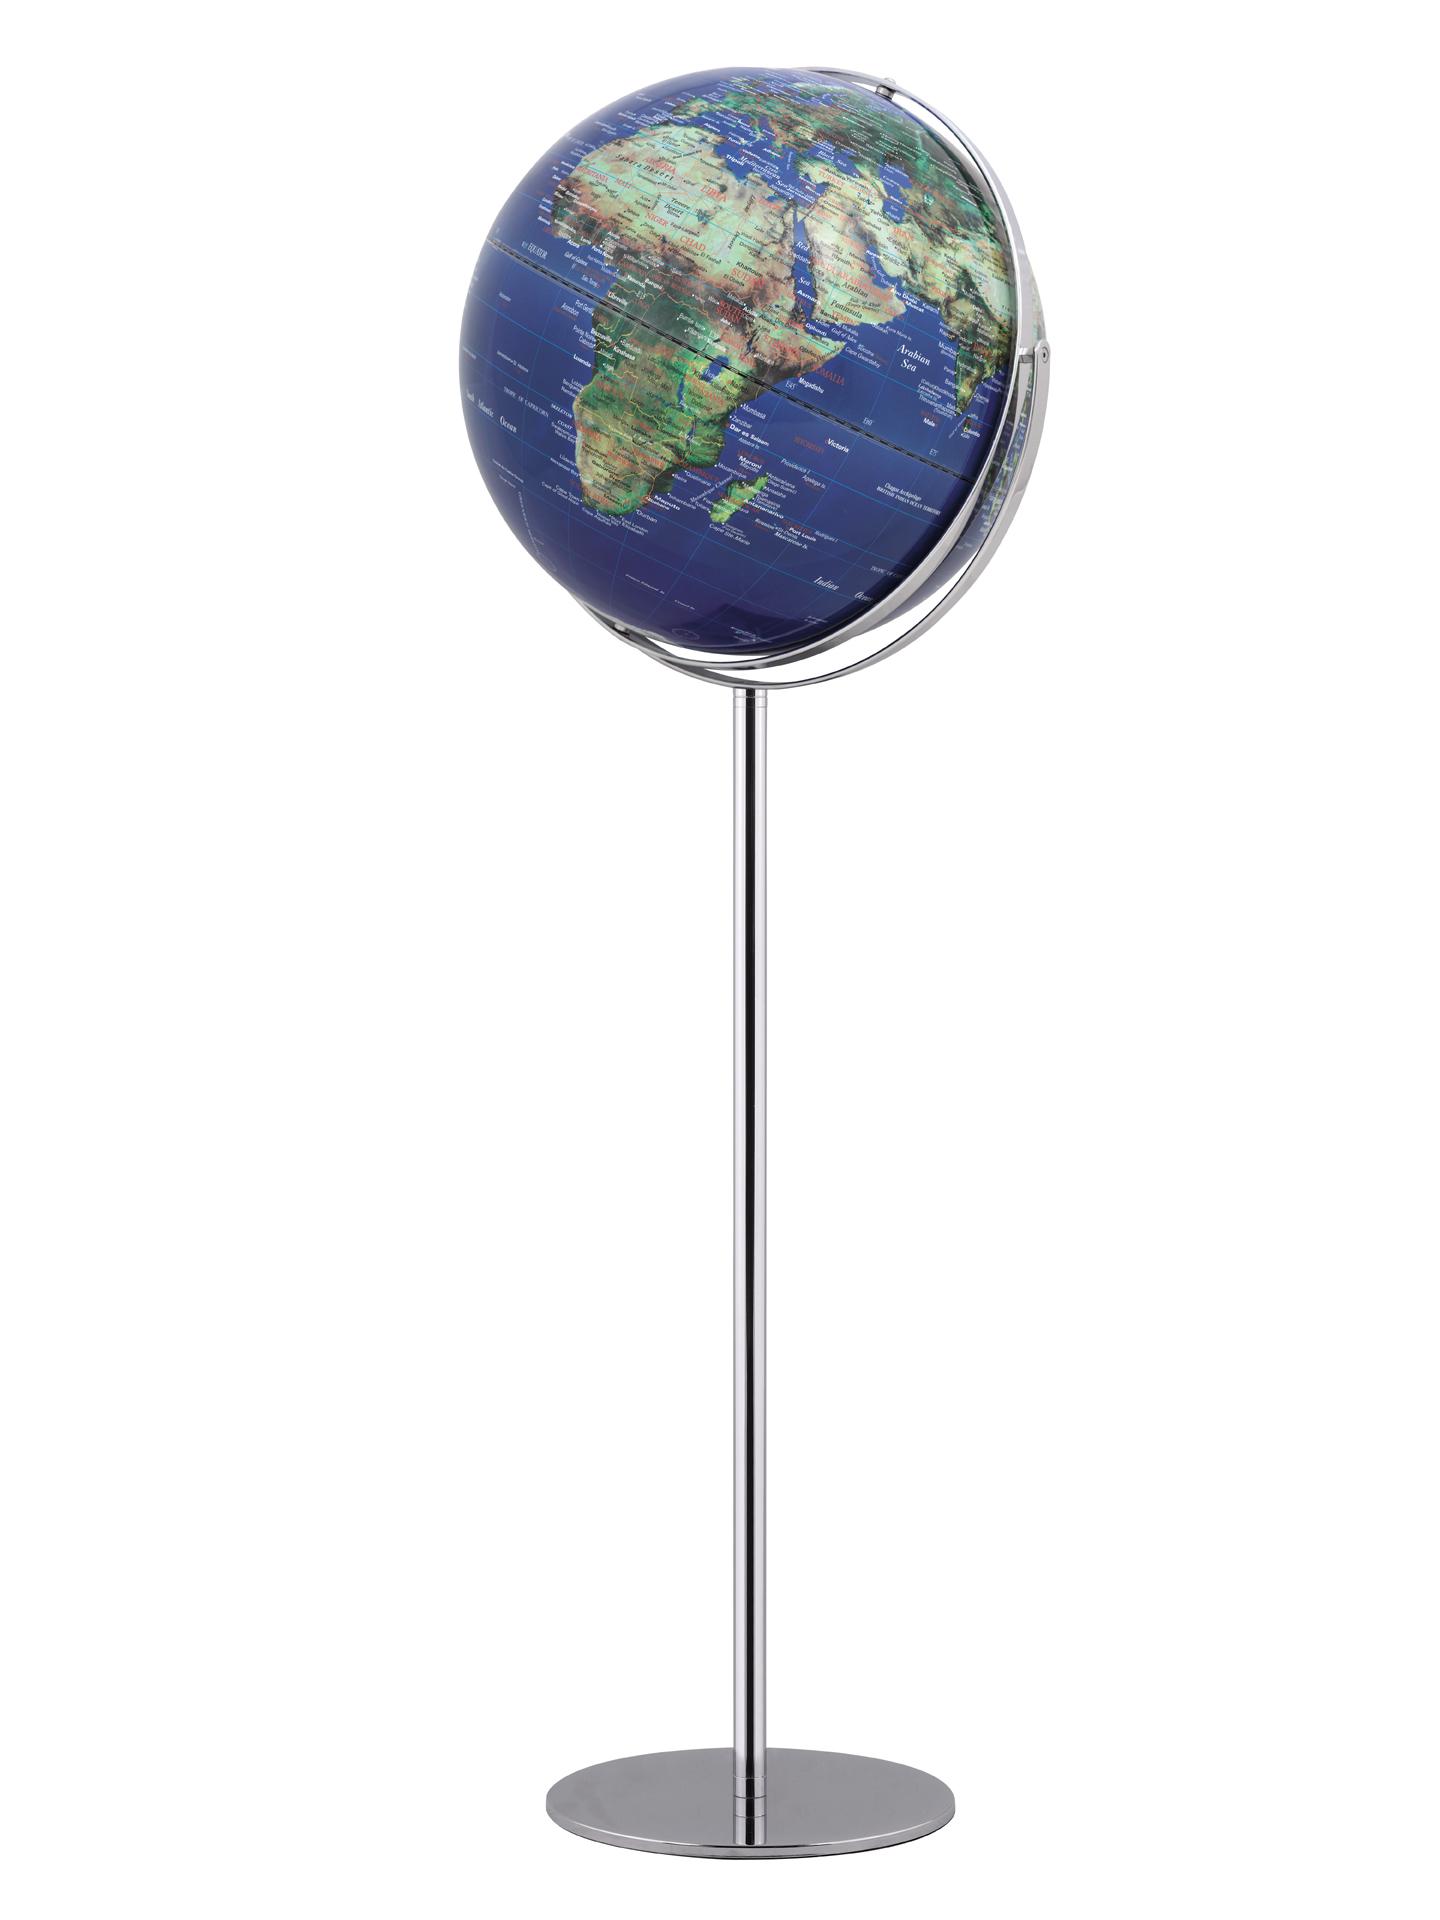 globus standglobus apollo 17 physisch no 2 relief designglobus 42cm durchmesser emform se 0779. Black Bedroom Furniture Sets. Home Design Ideas